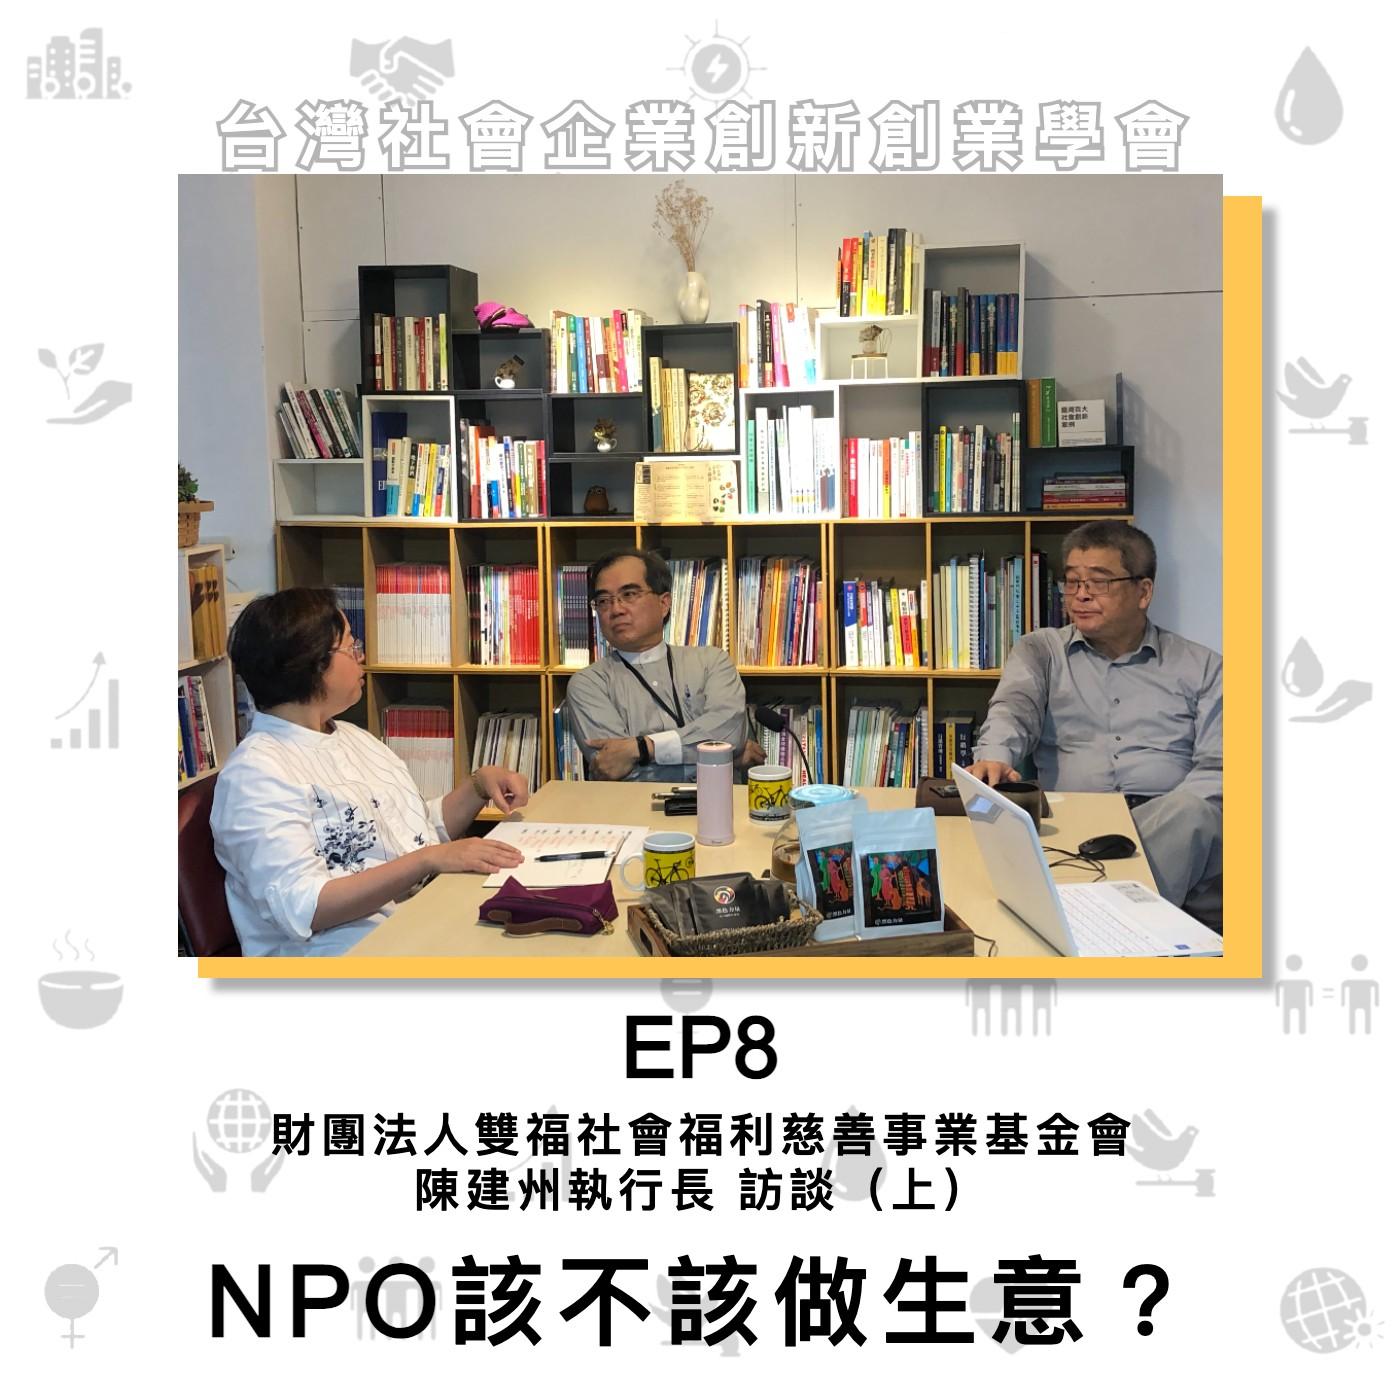 EP8: 財團法人雙福社會福利慈善事業基金會  陳建州執行長 訪談(上):NPO該不該做生意?